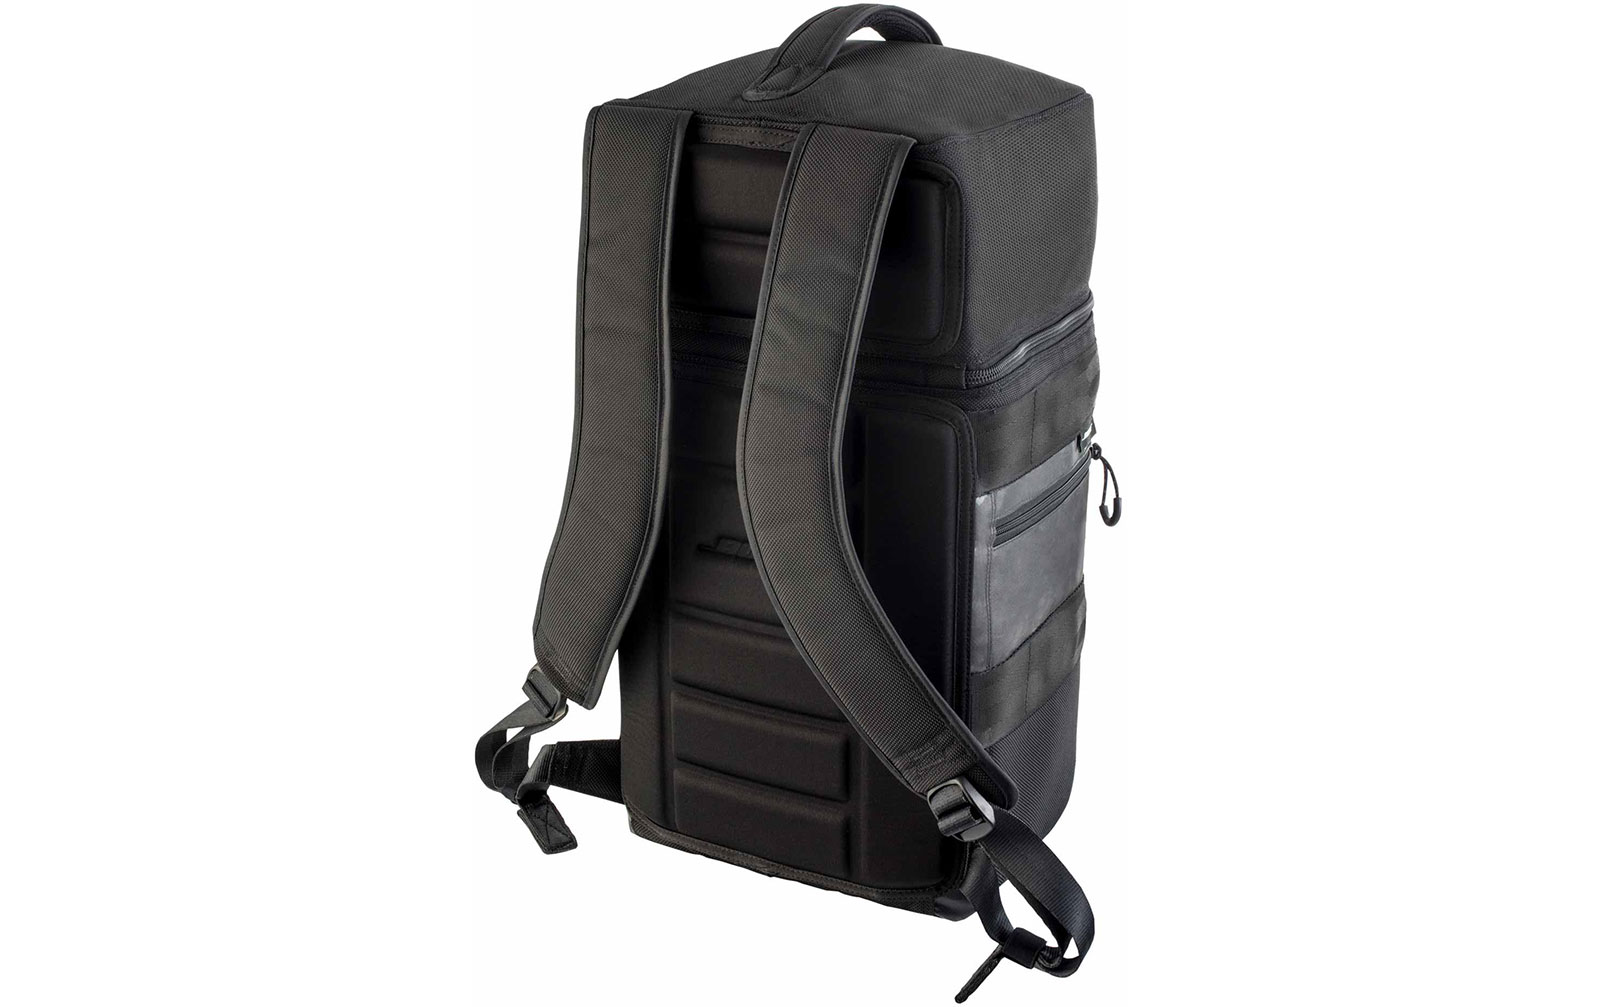 bose-s1-backpack-rucksack